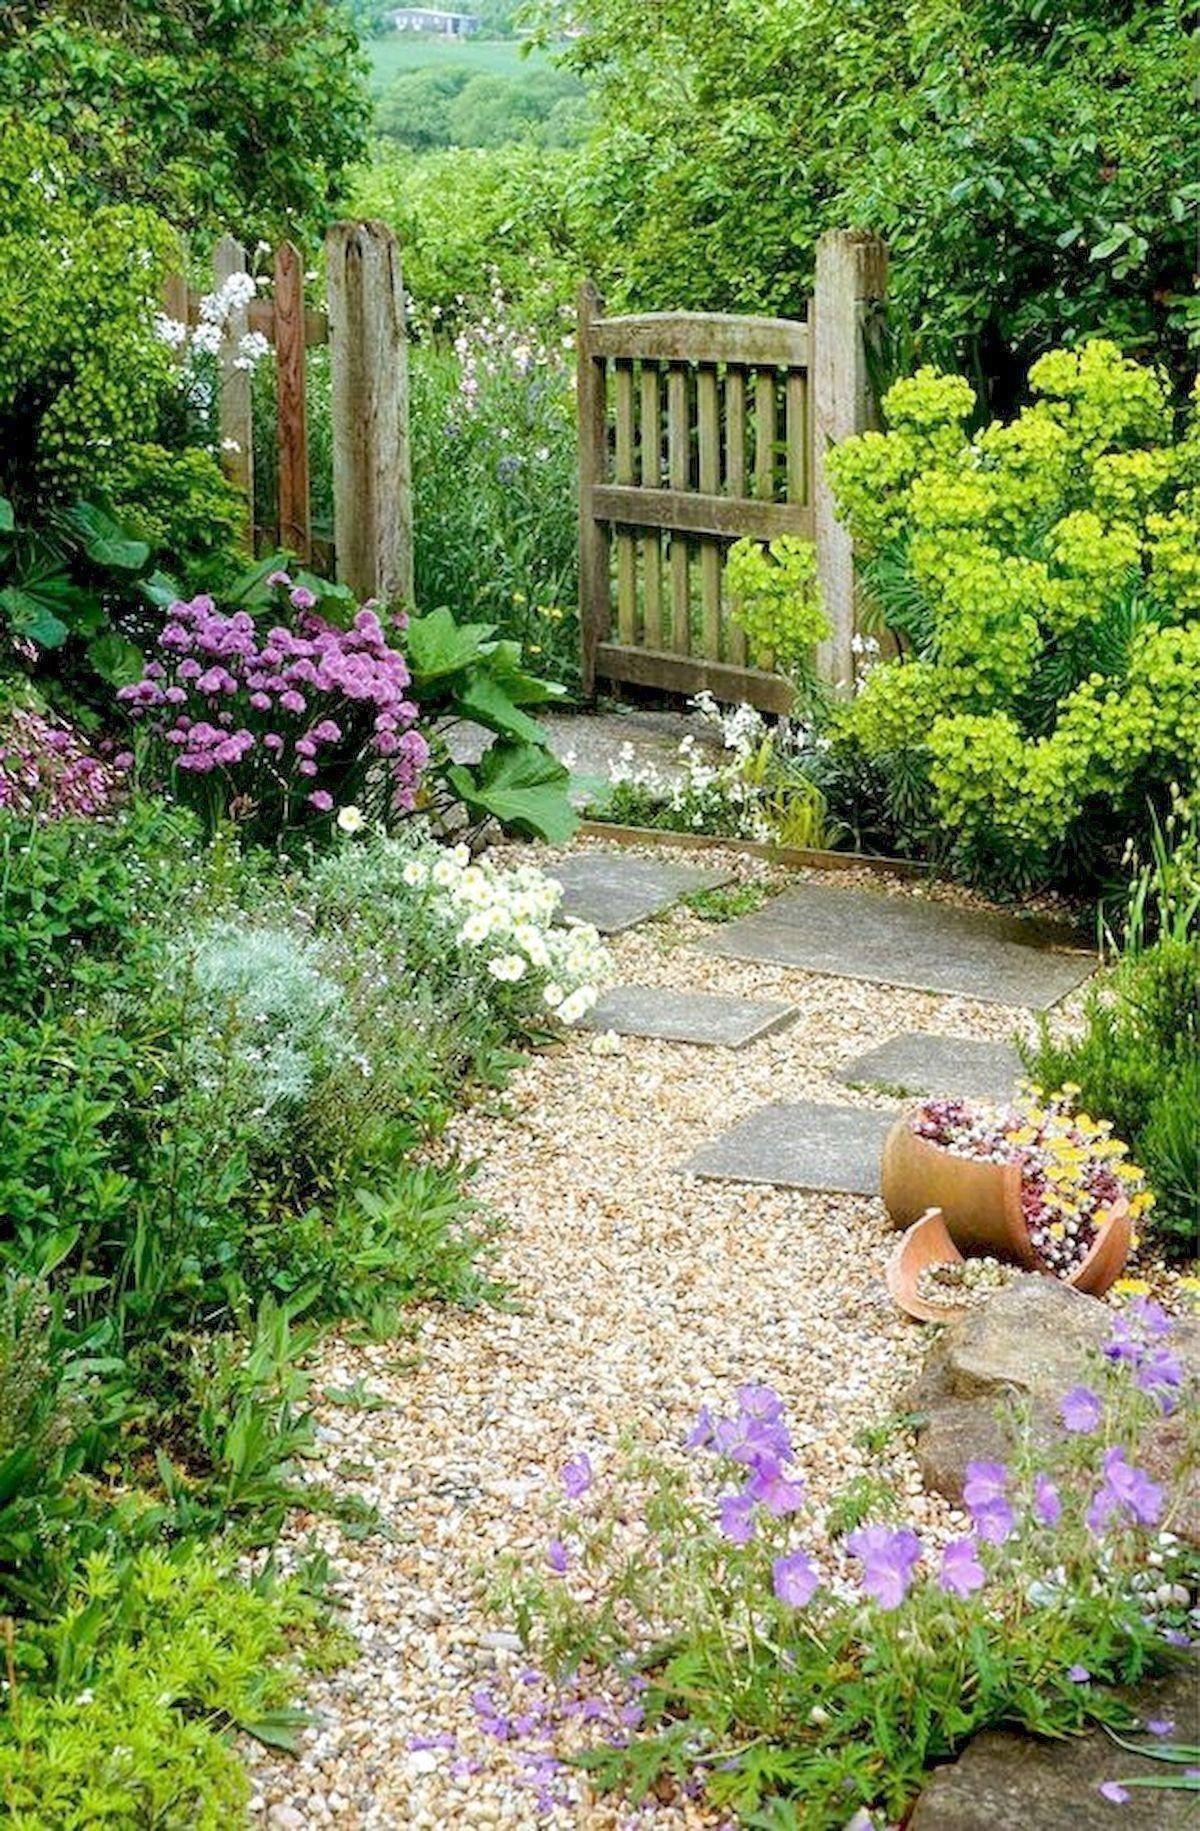 Small Garden Design Ideas Low Maintenance 6 Home Decor Diy Design In 2020 Small Cottage Garden Ideas Small Garden Design Garden Design